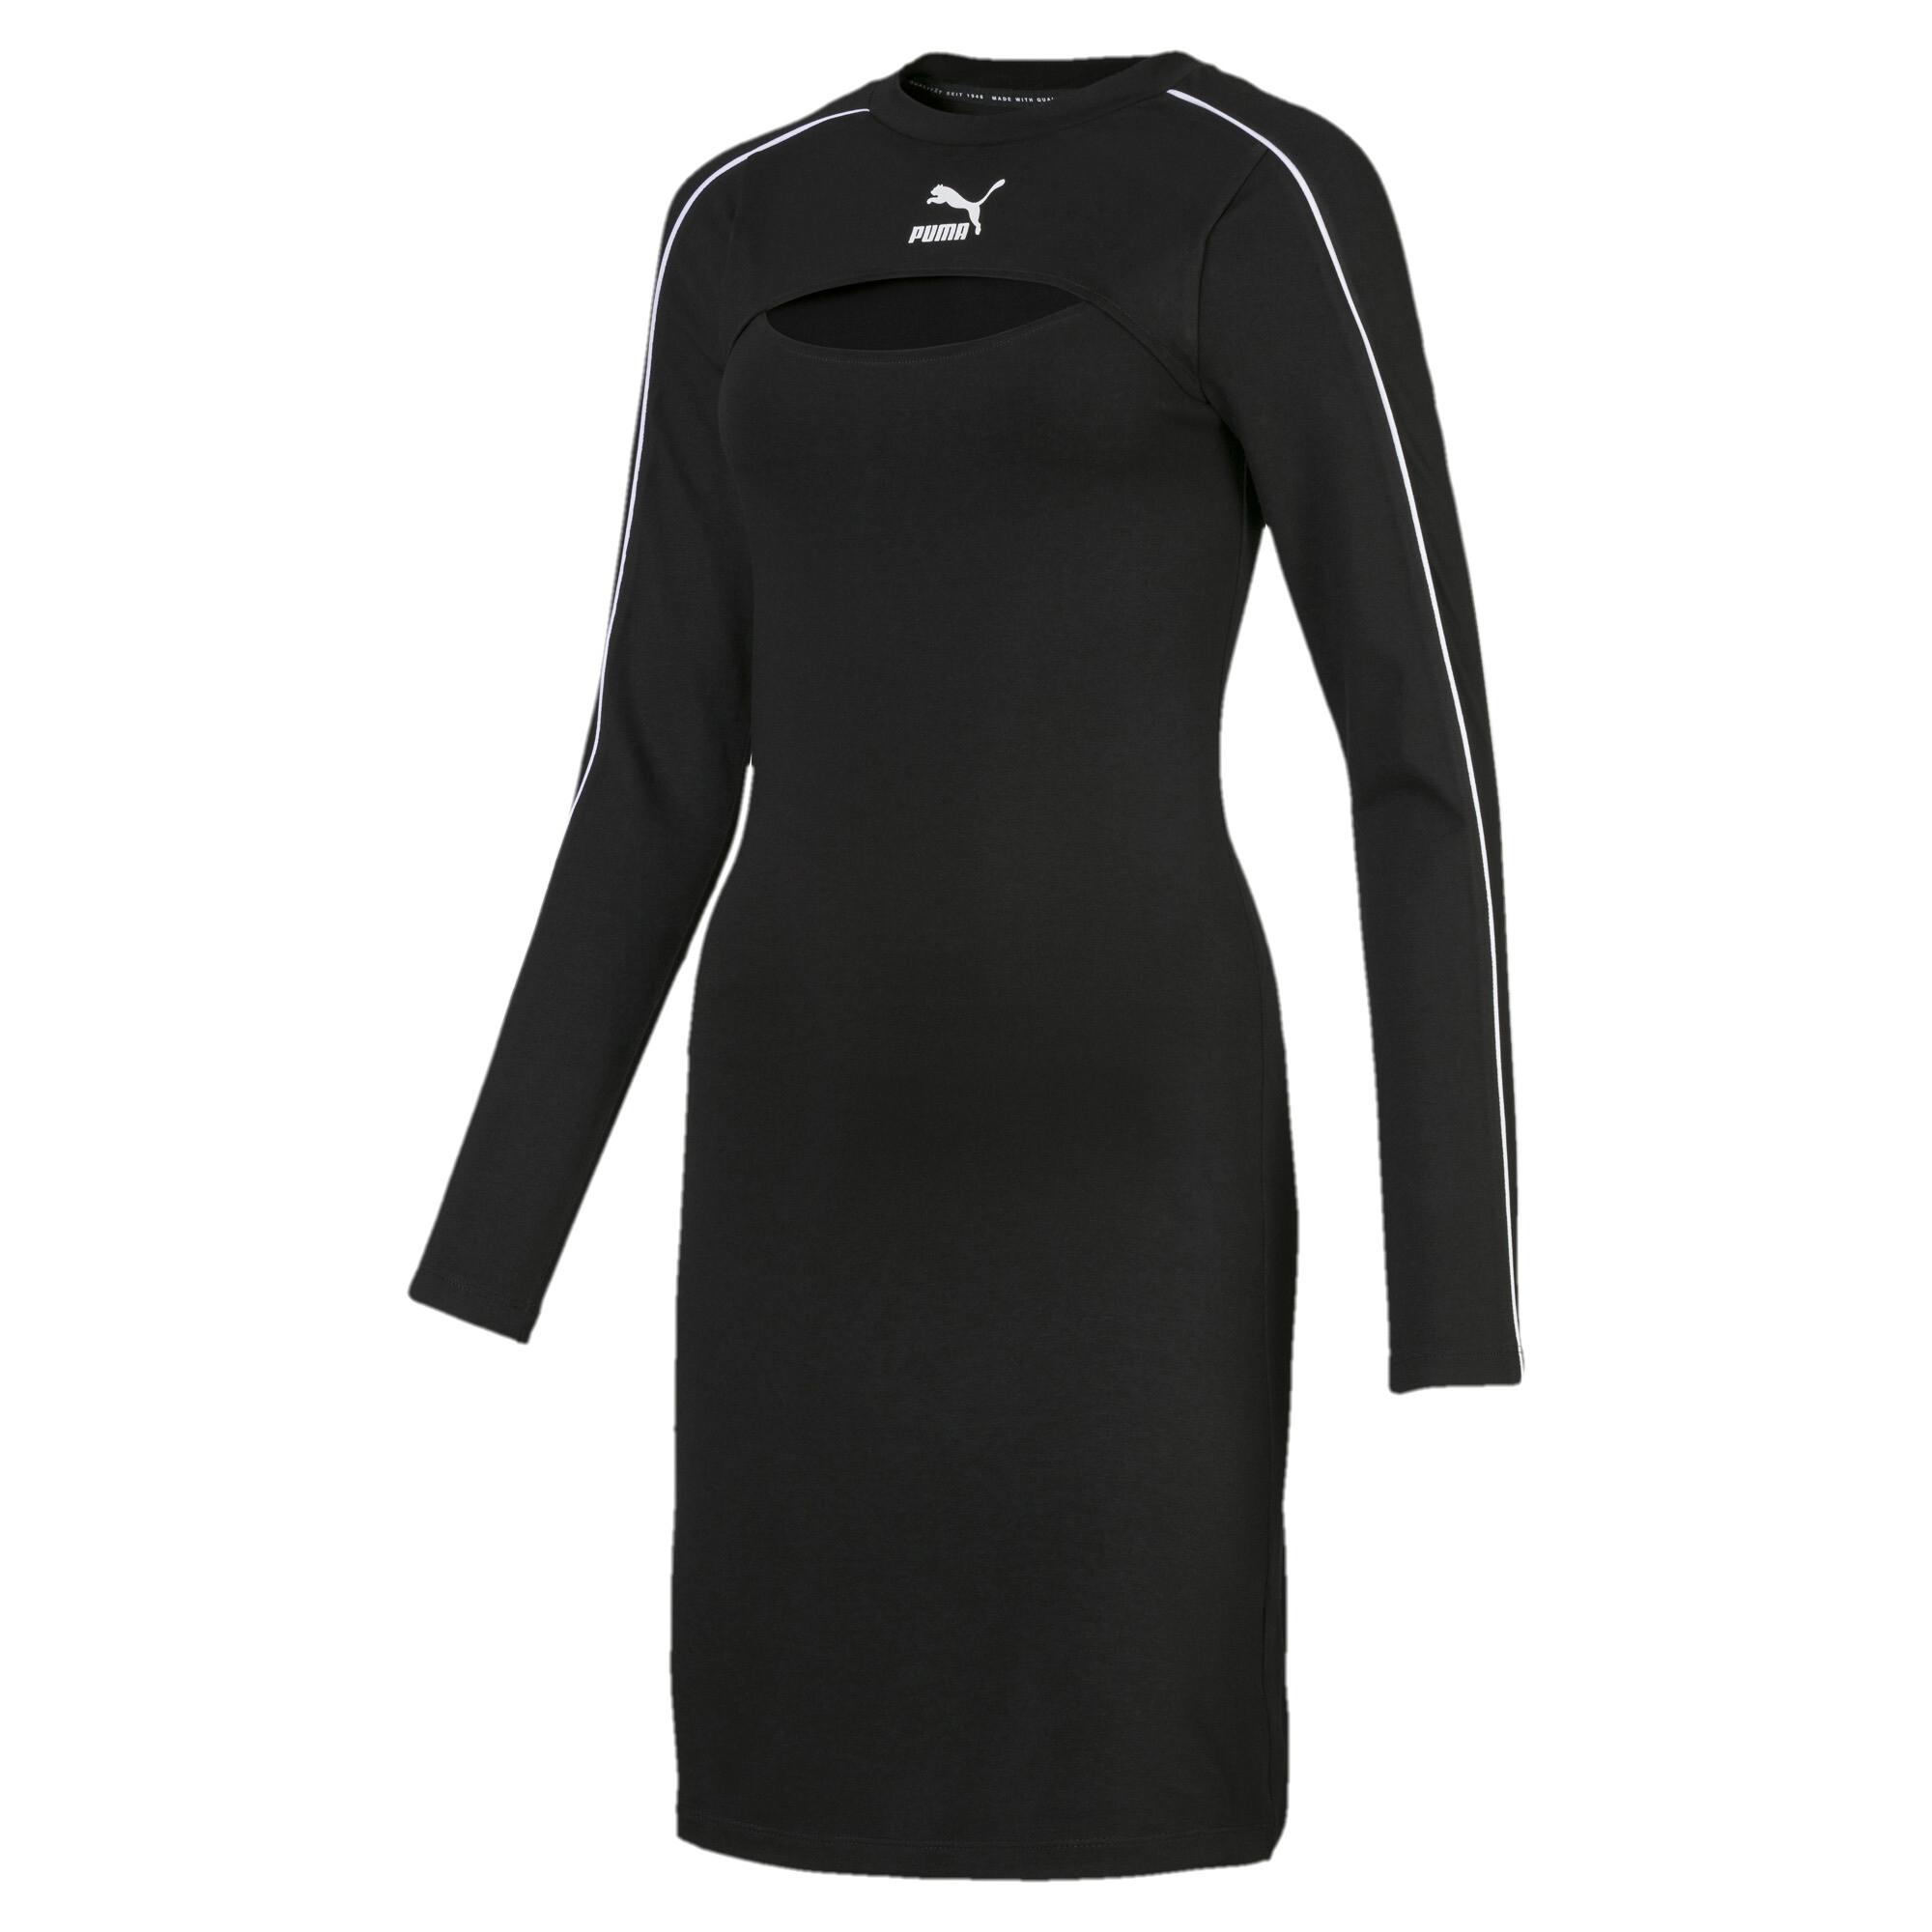 da53d053cc05df PUMA® Women's Shoes, Clothing, Gear for Running, Workout Gear & More